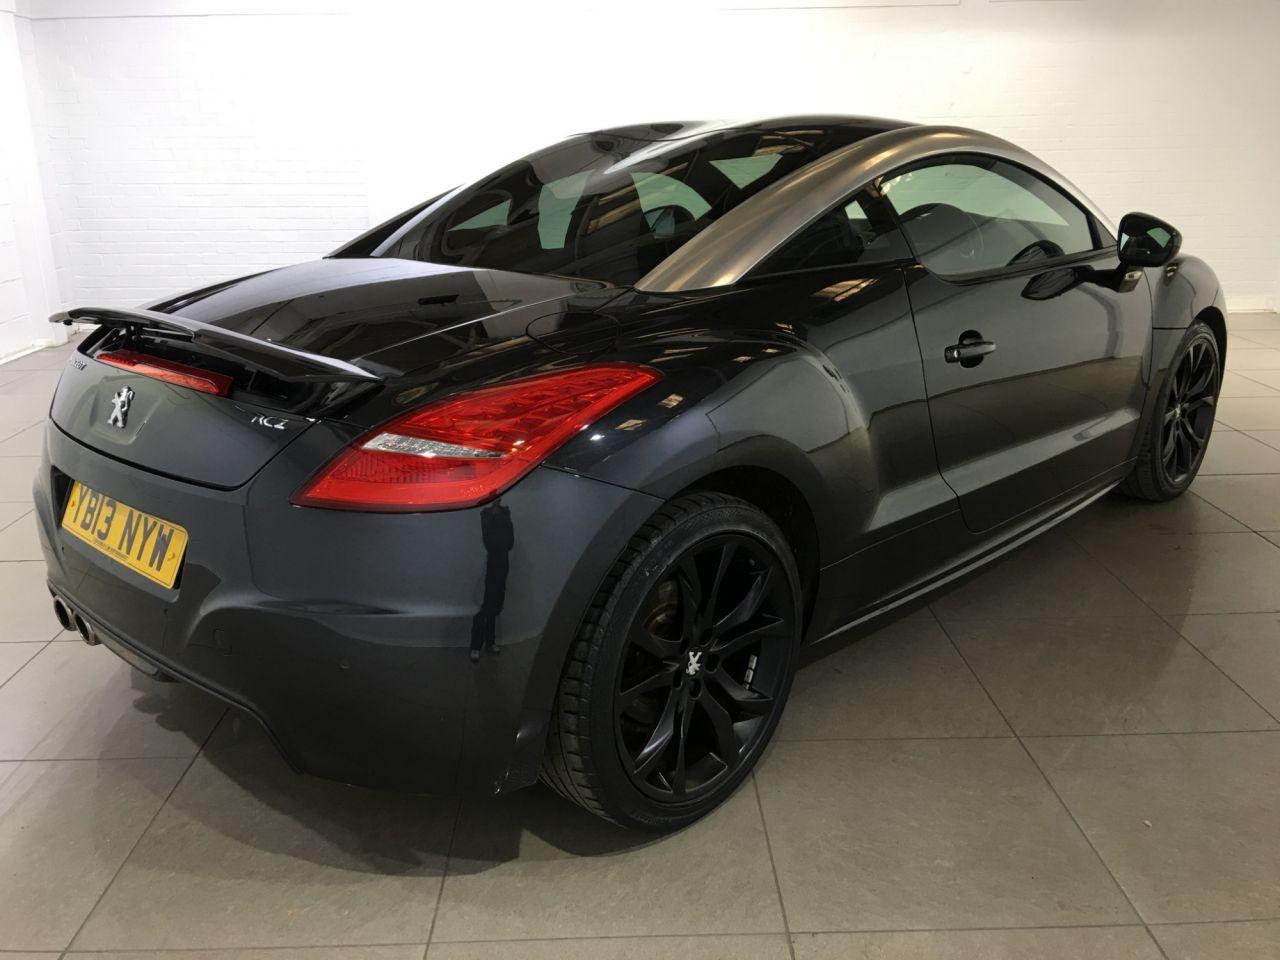 2013 Peugeot Rcz Thp GT £9,490, 2020